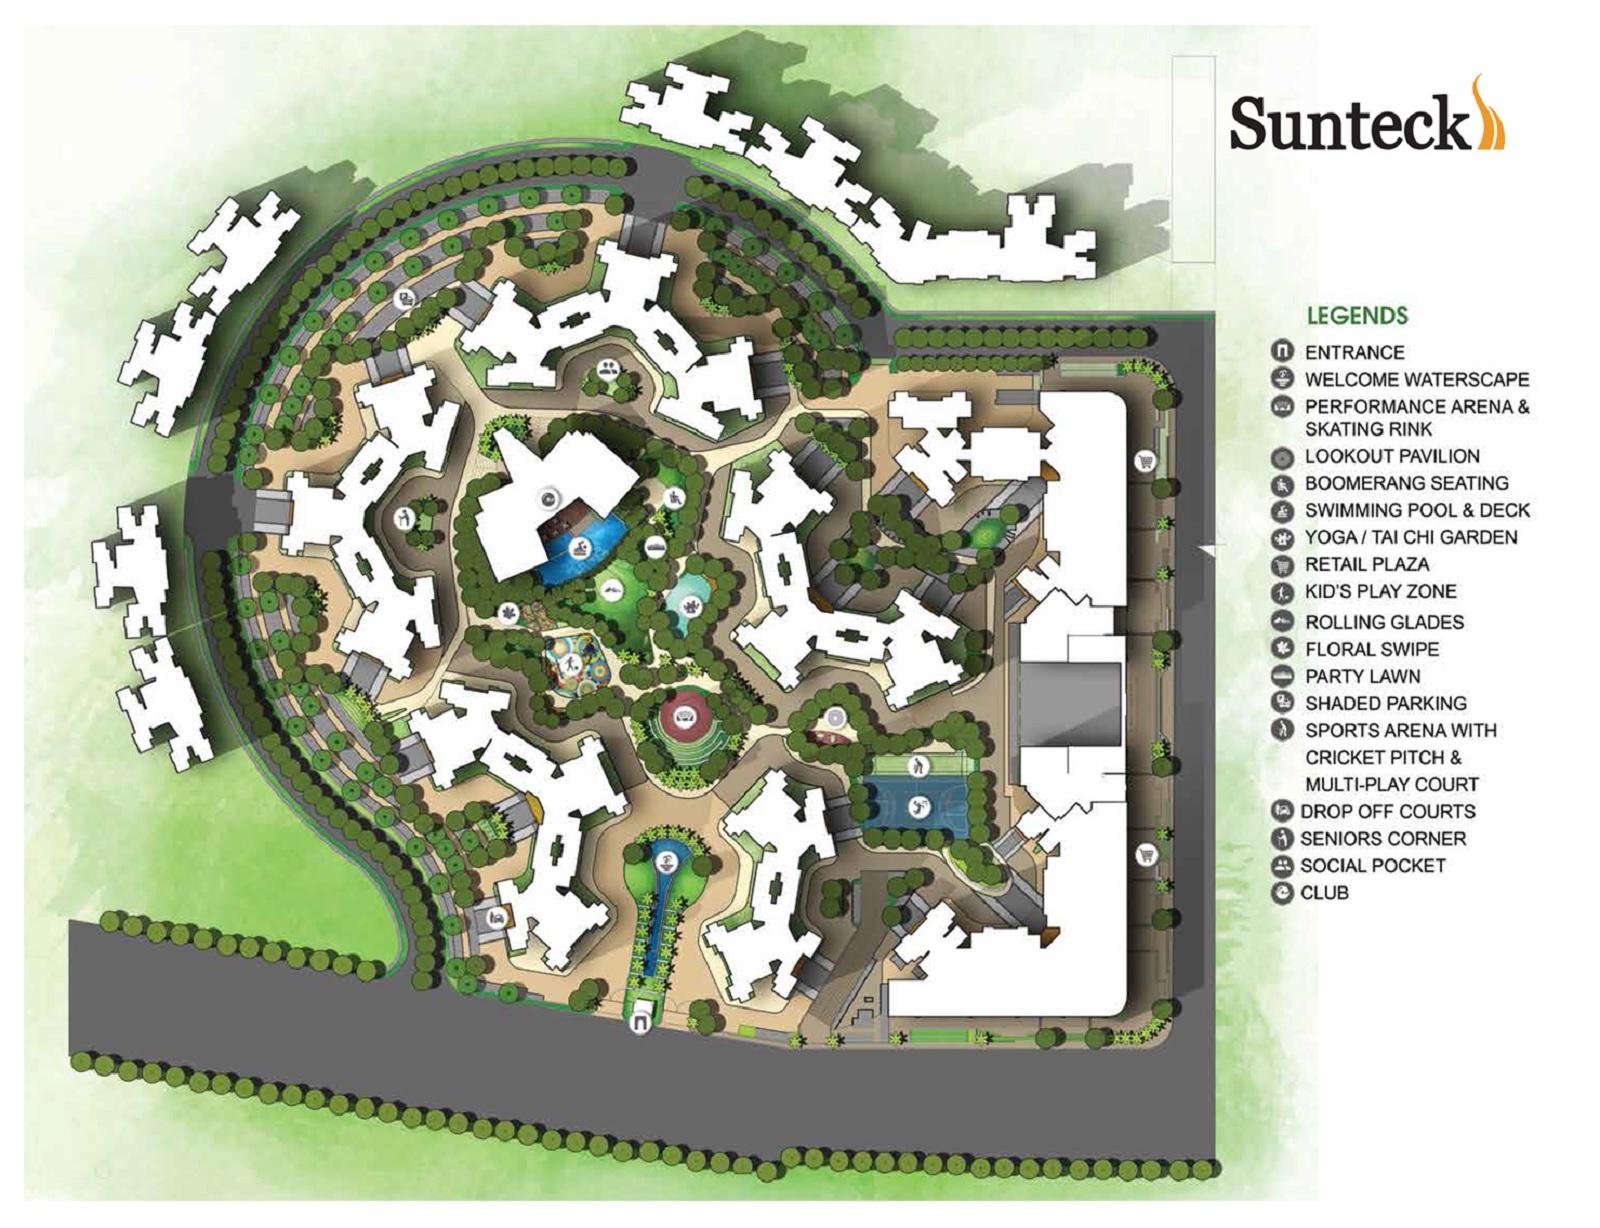 sunteck maxxworld 6 project master plan image1